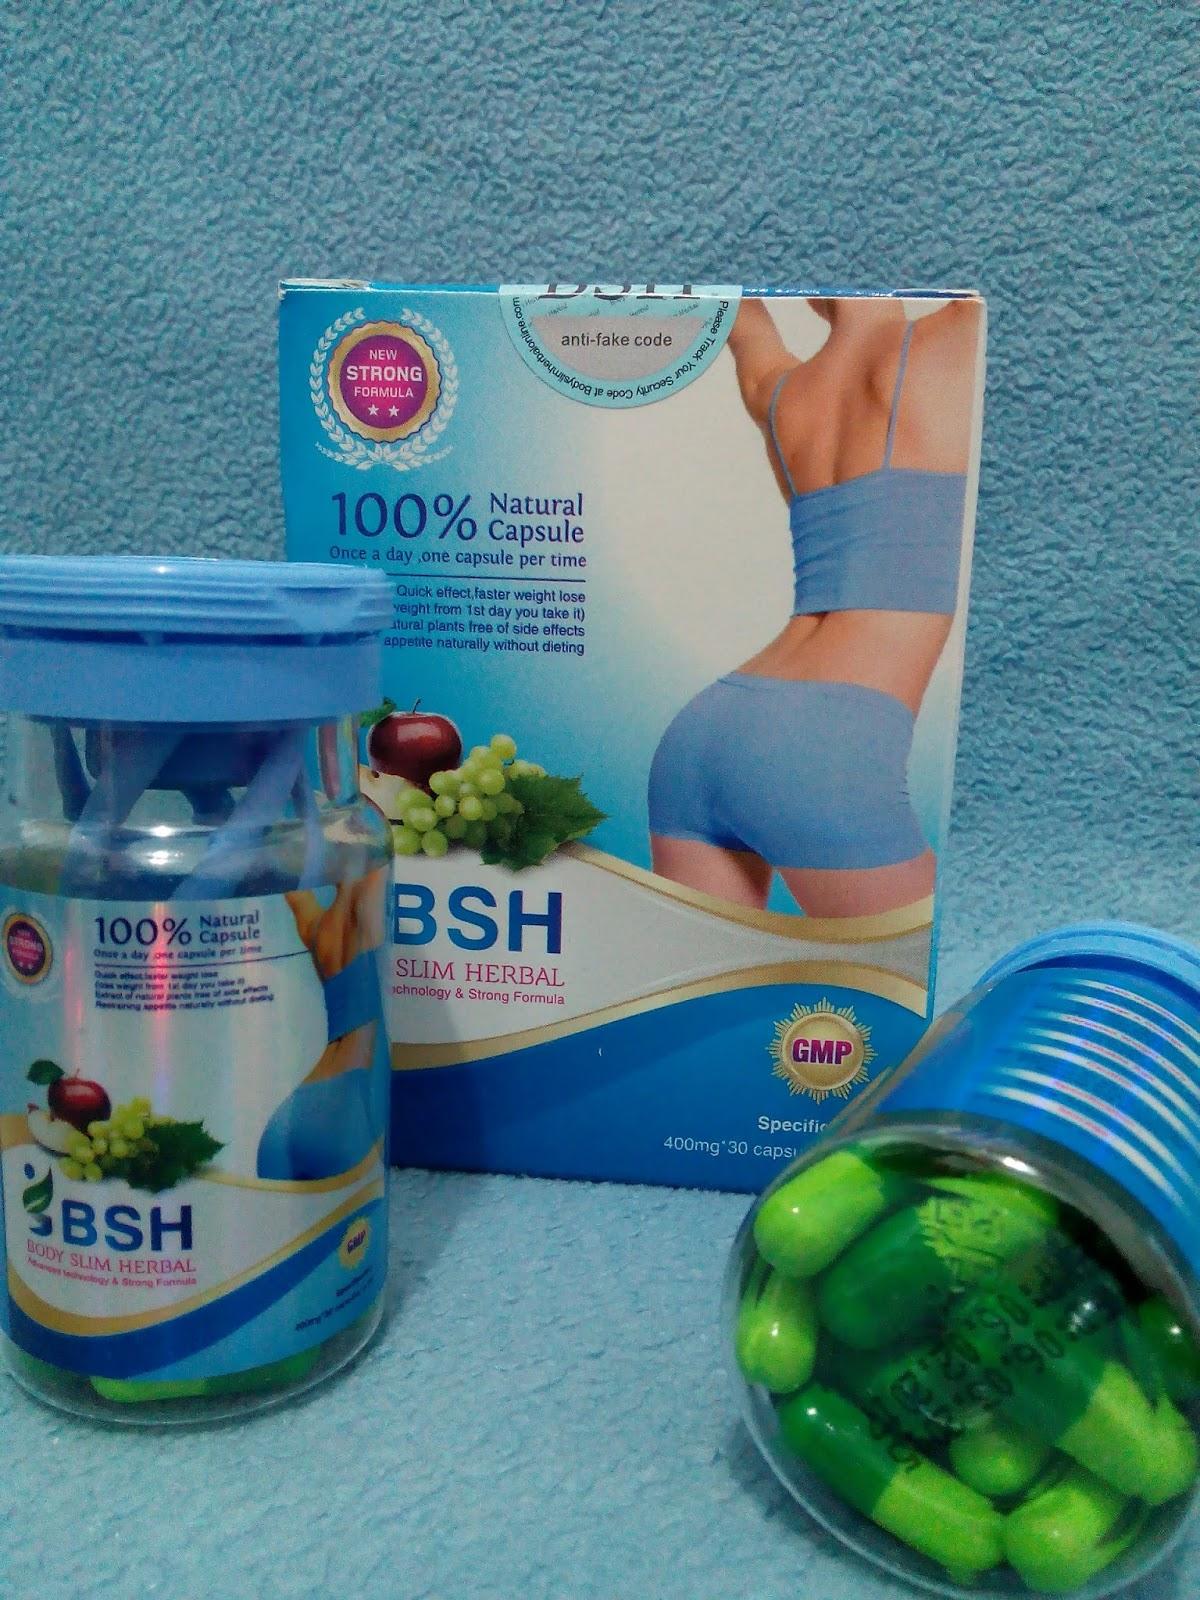 Putry Kosmetik Pelangsing Aichun Hot Gel Slimming Green Tea Pengecil Perut Asliii Ya